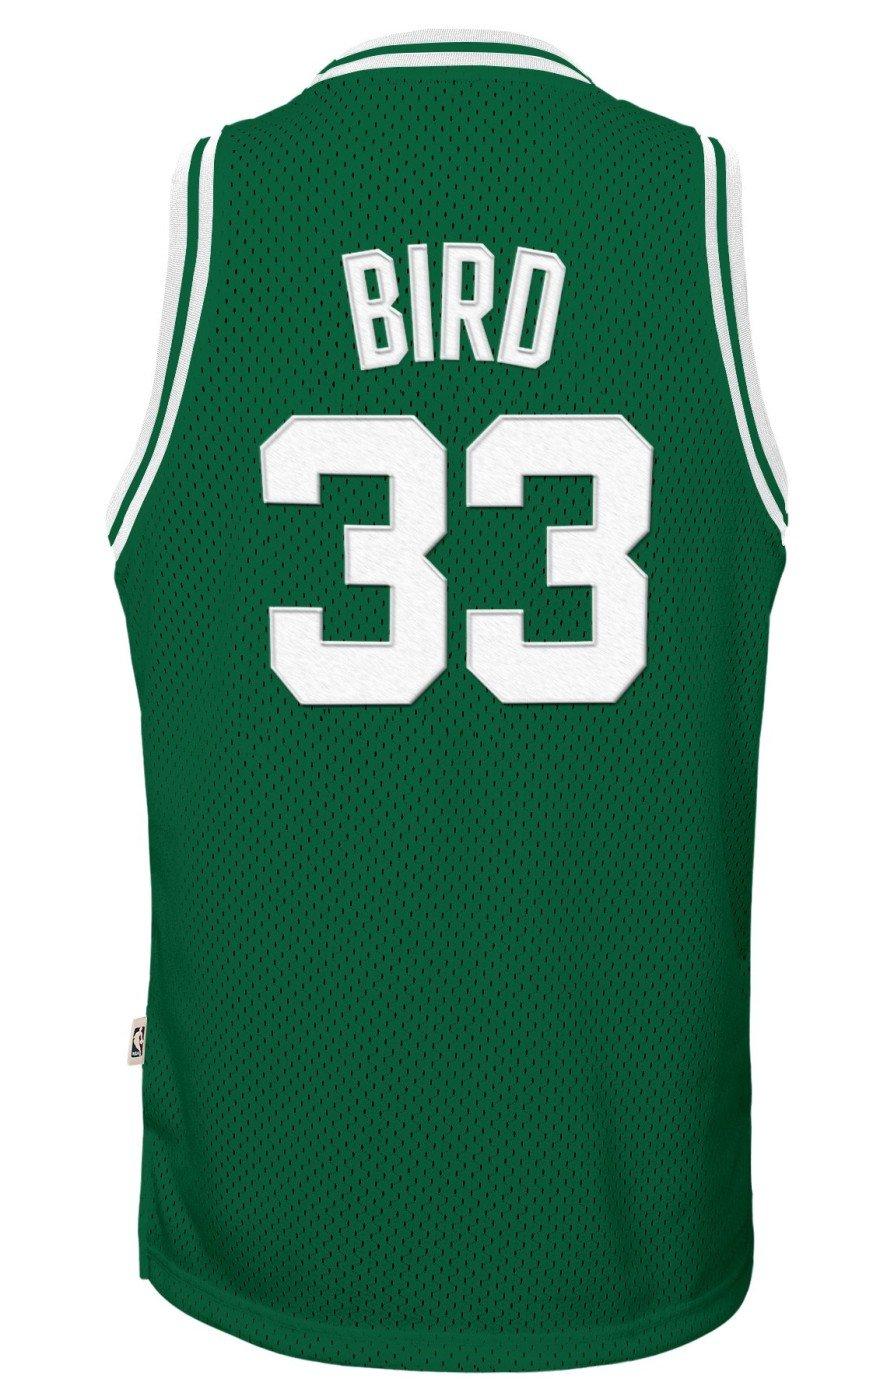 32b80ec01ae Amazon.com : Genuine Stuff Larry Bird Boston Celtics NBA Youth Throwback  Swingman Jersey - Green : Sports & Outdoors